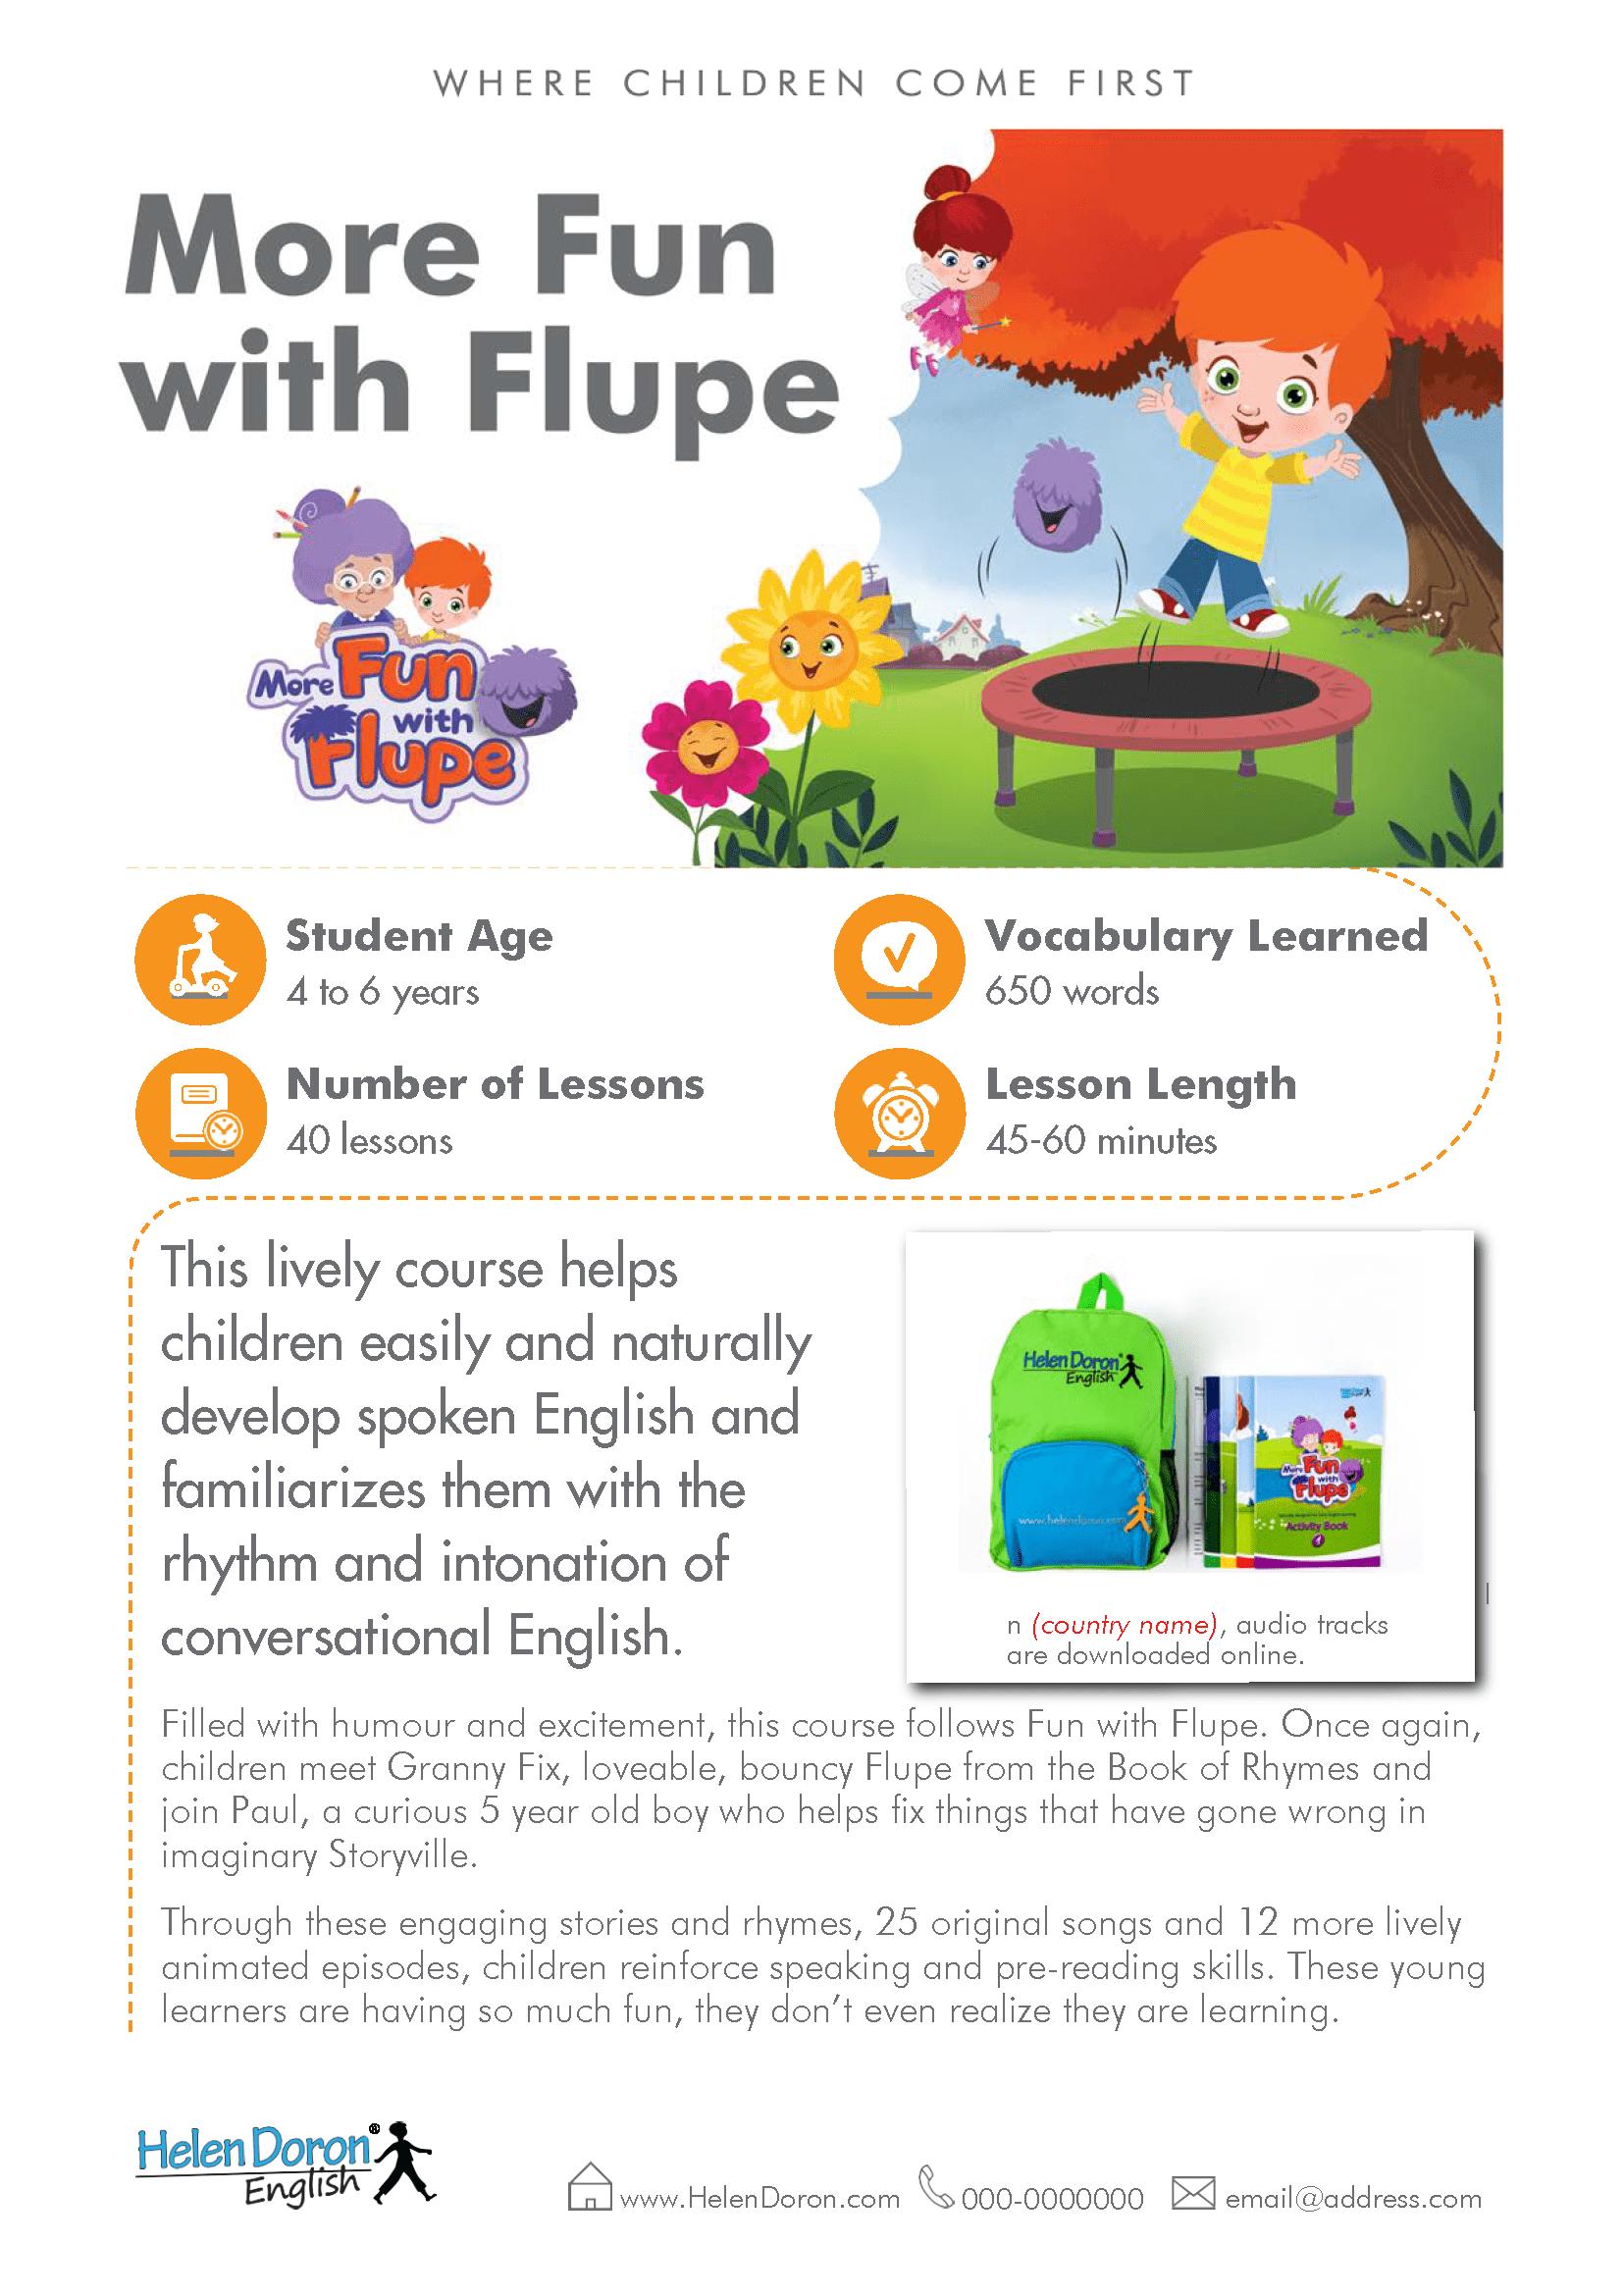 Letöltés - More Fun with Flupe